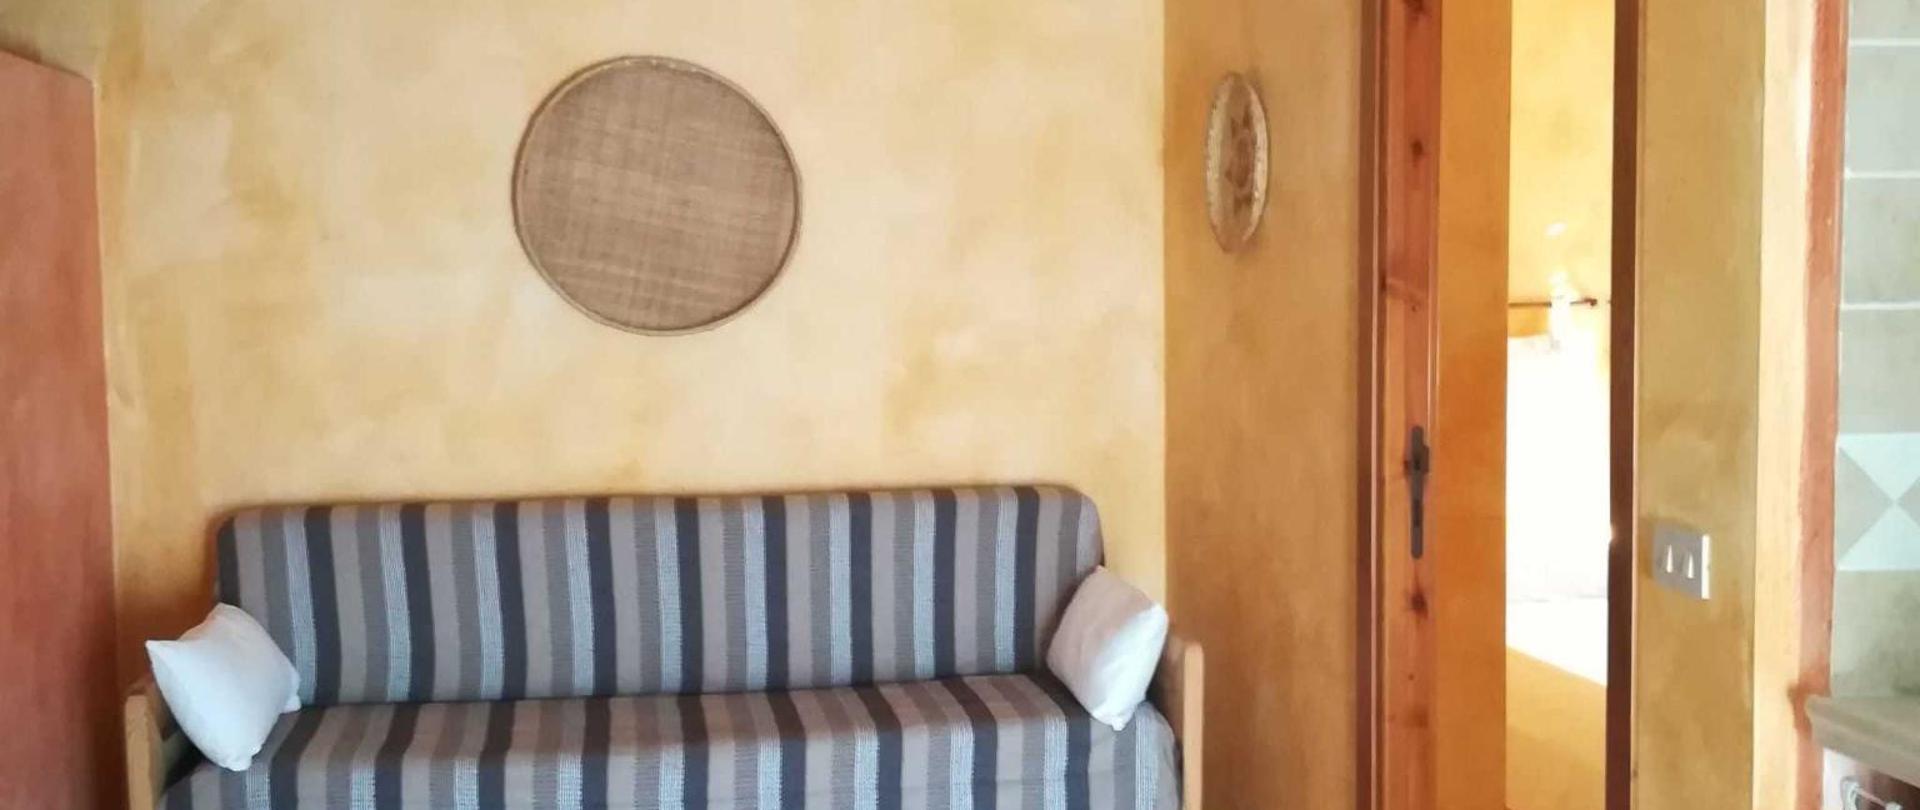 divano-1.jpg